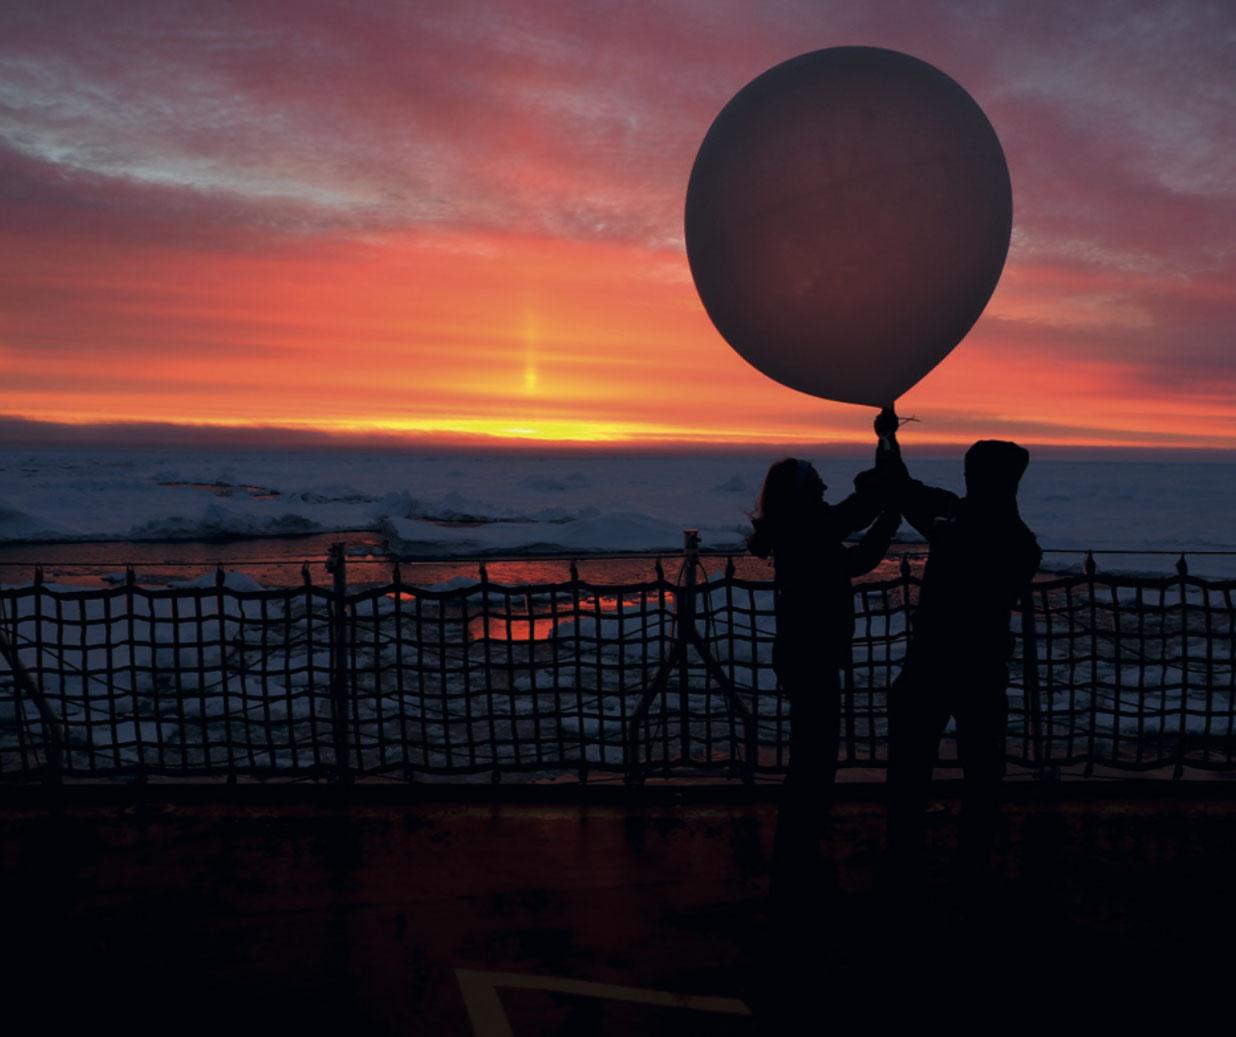 Weather Ballons